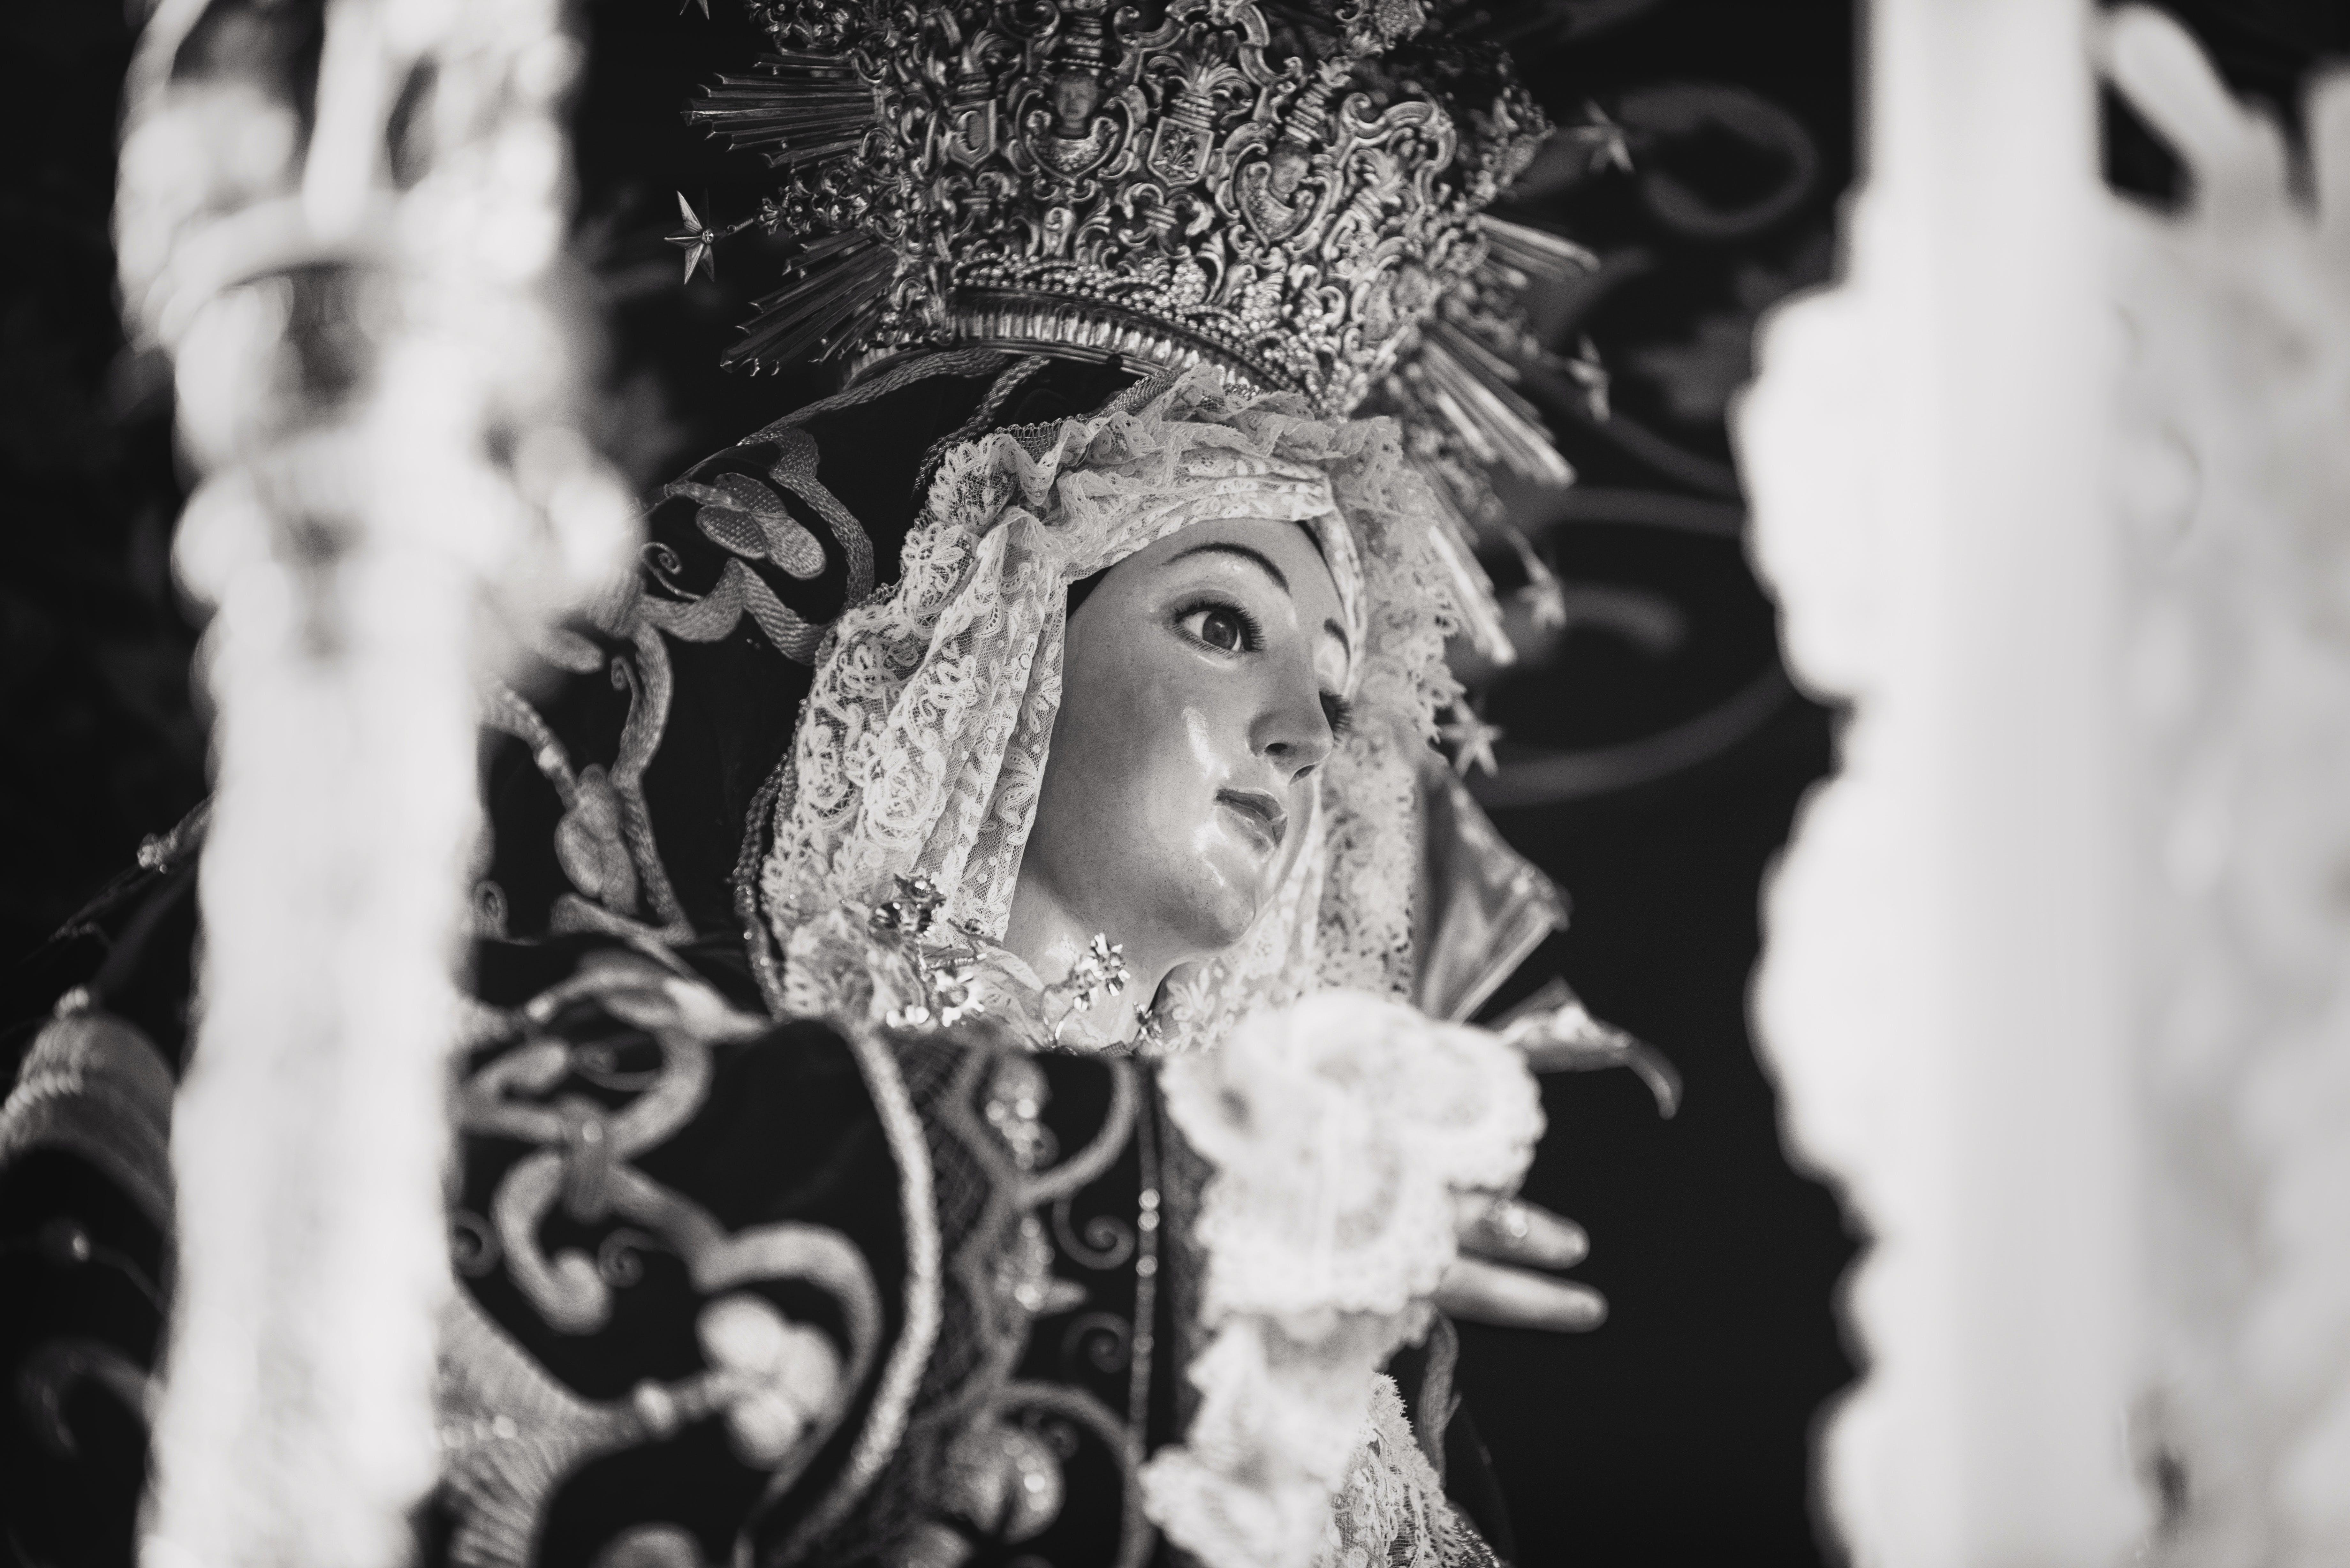 Grayscale Photo of Religious Figurine